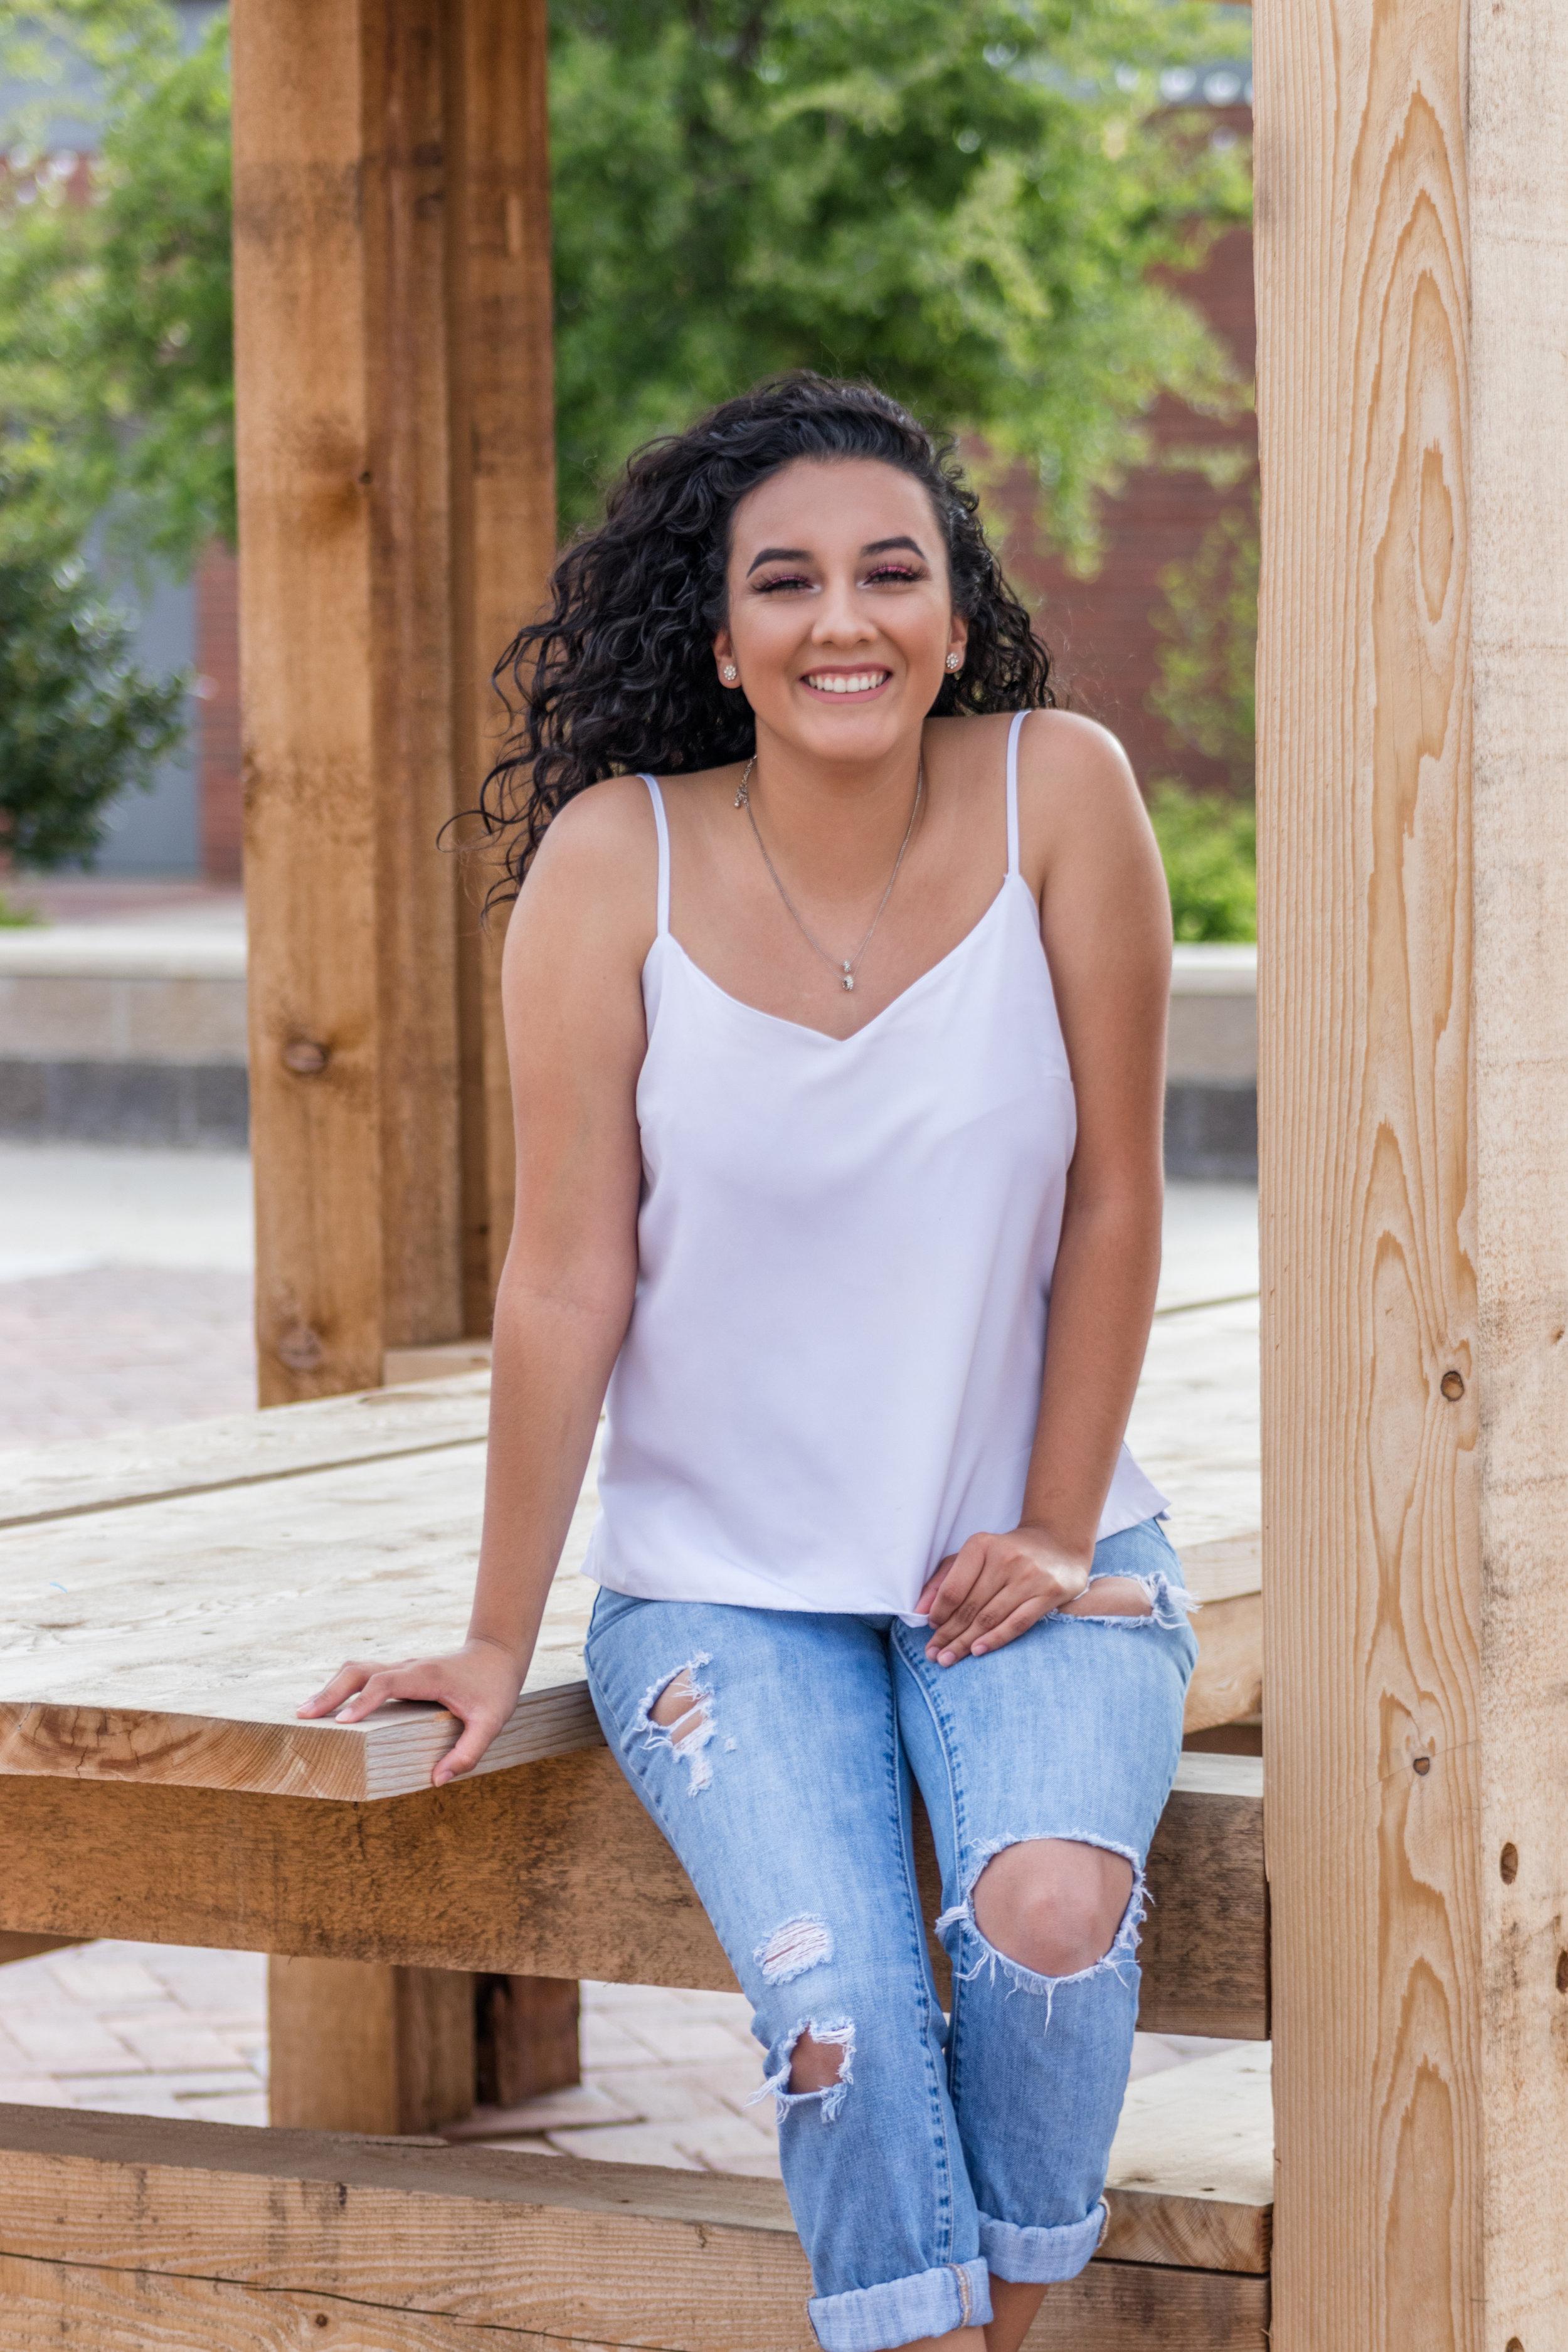 #42 Stephanie *Azanita* Marquez - VP of Recruitment   Fall 2016 - Epsilon Line  Nationality: Mexican-American  Major: Biology